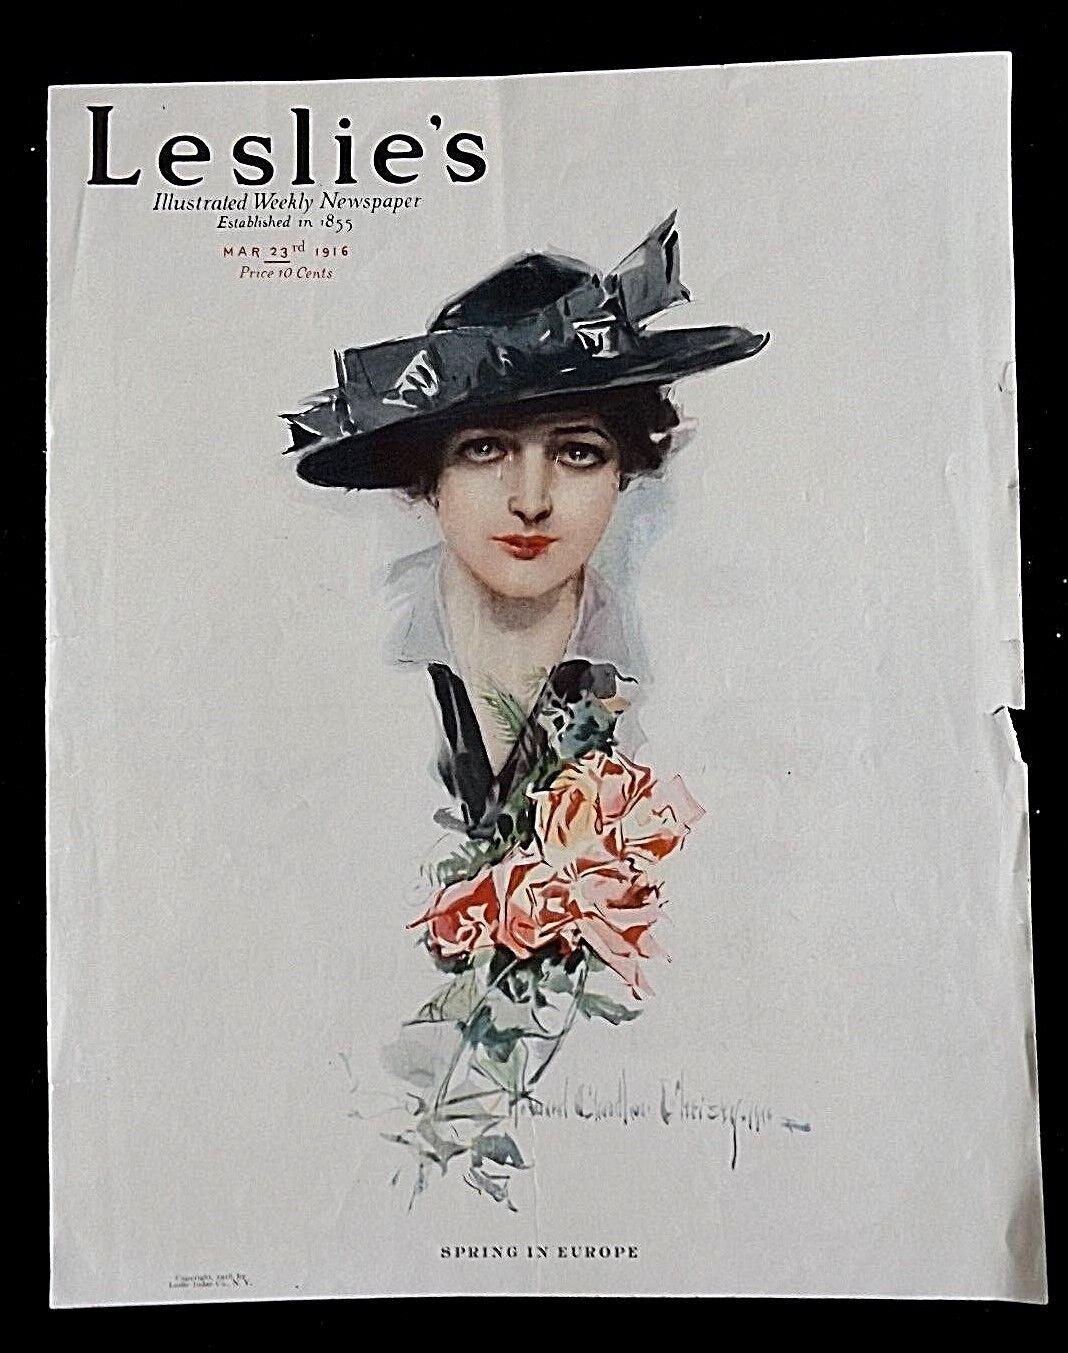 1916 Leslie s Cover Print Lady Black Hat Red Roses Howard Chandler Christy - $2.49